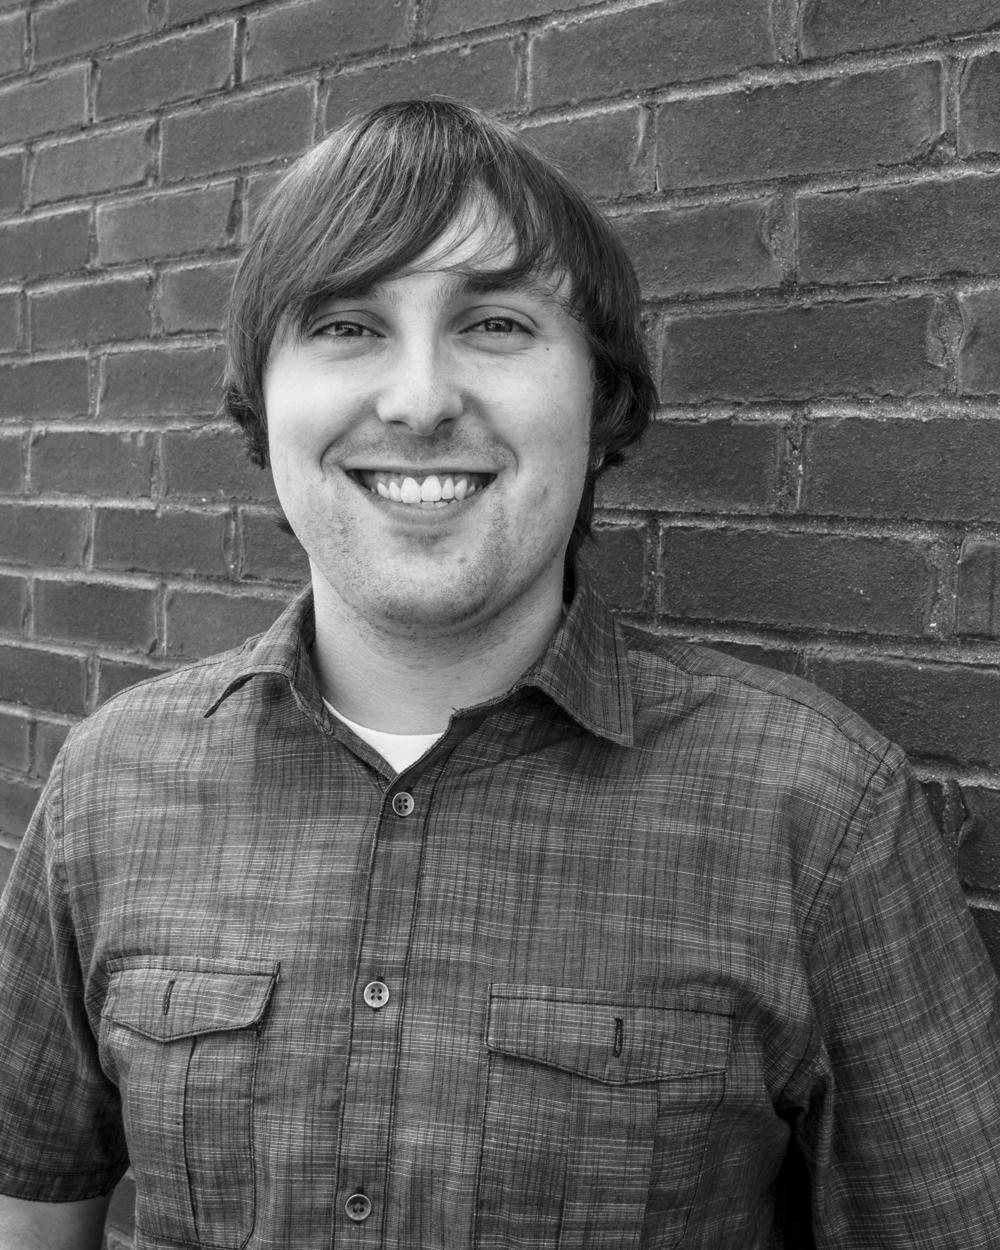 RYAN PUCK | CREATIVE SERVICES SPECIALIST